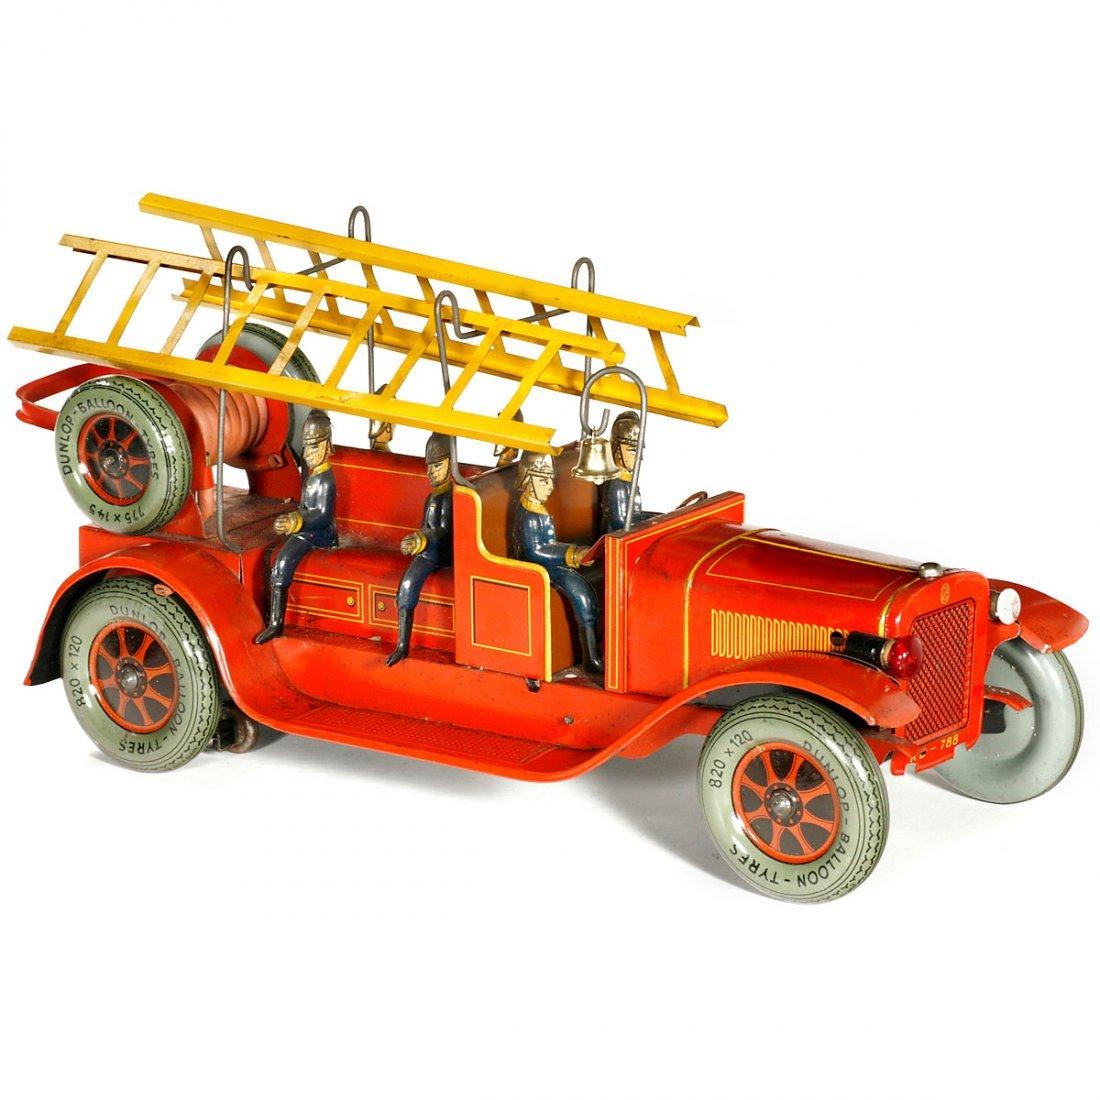 Fire Brigade Crew Wagon by Karl Bub